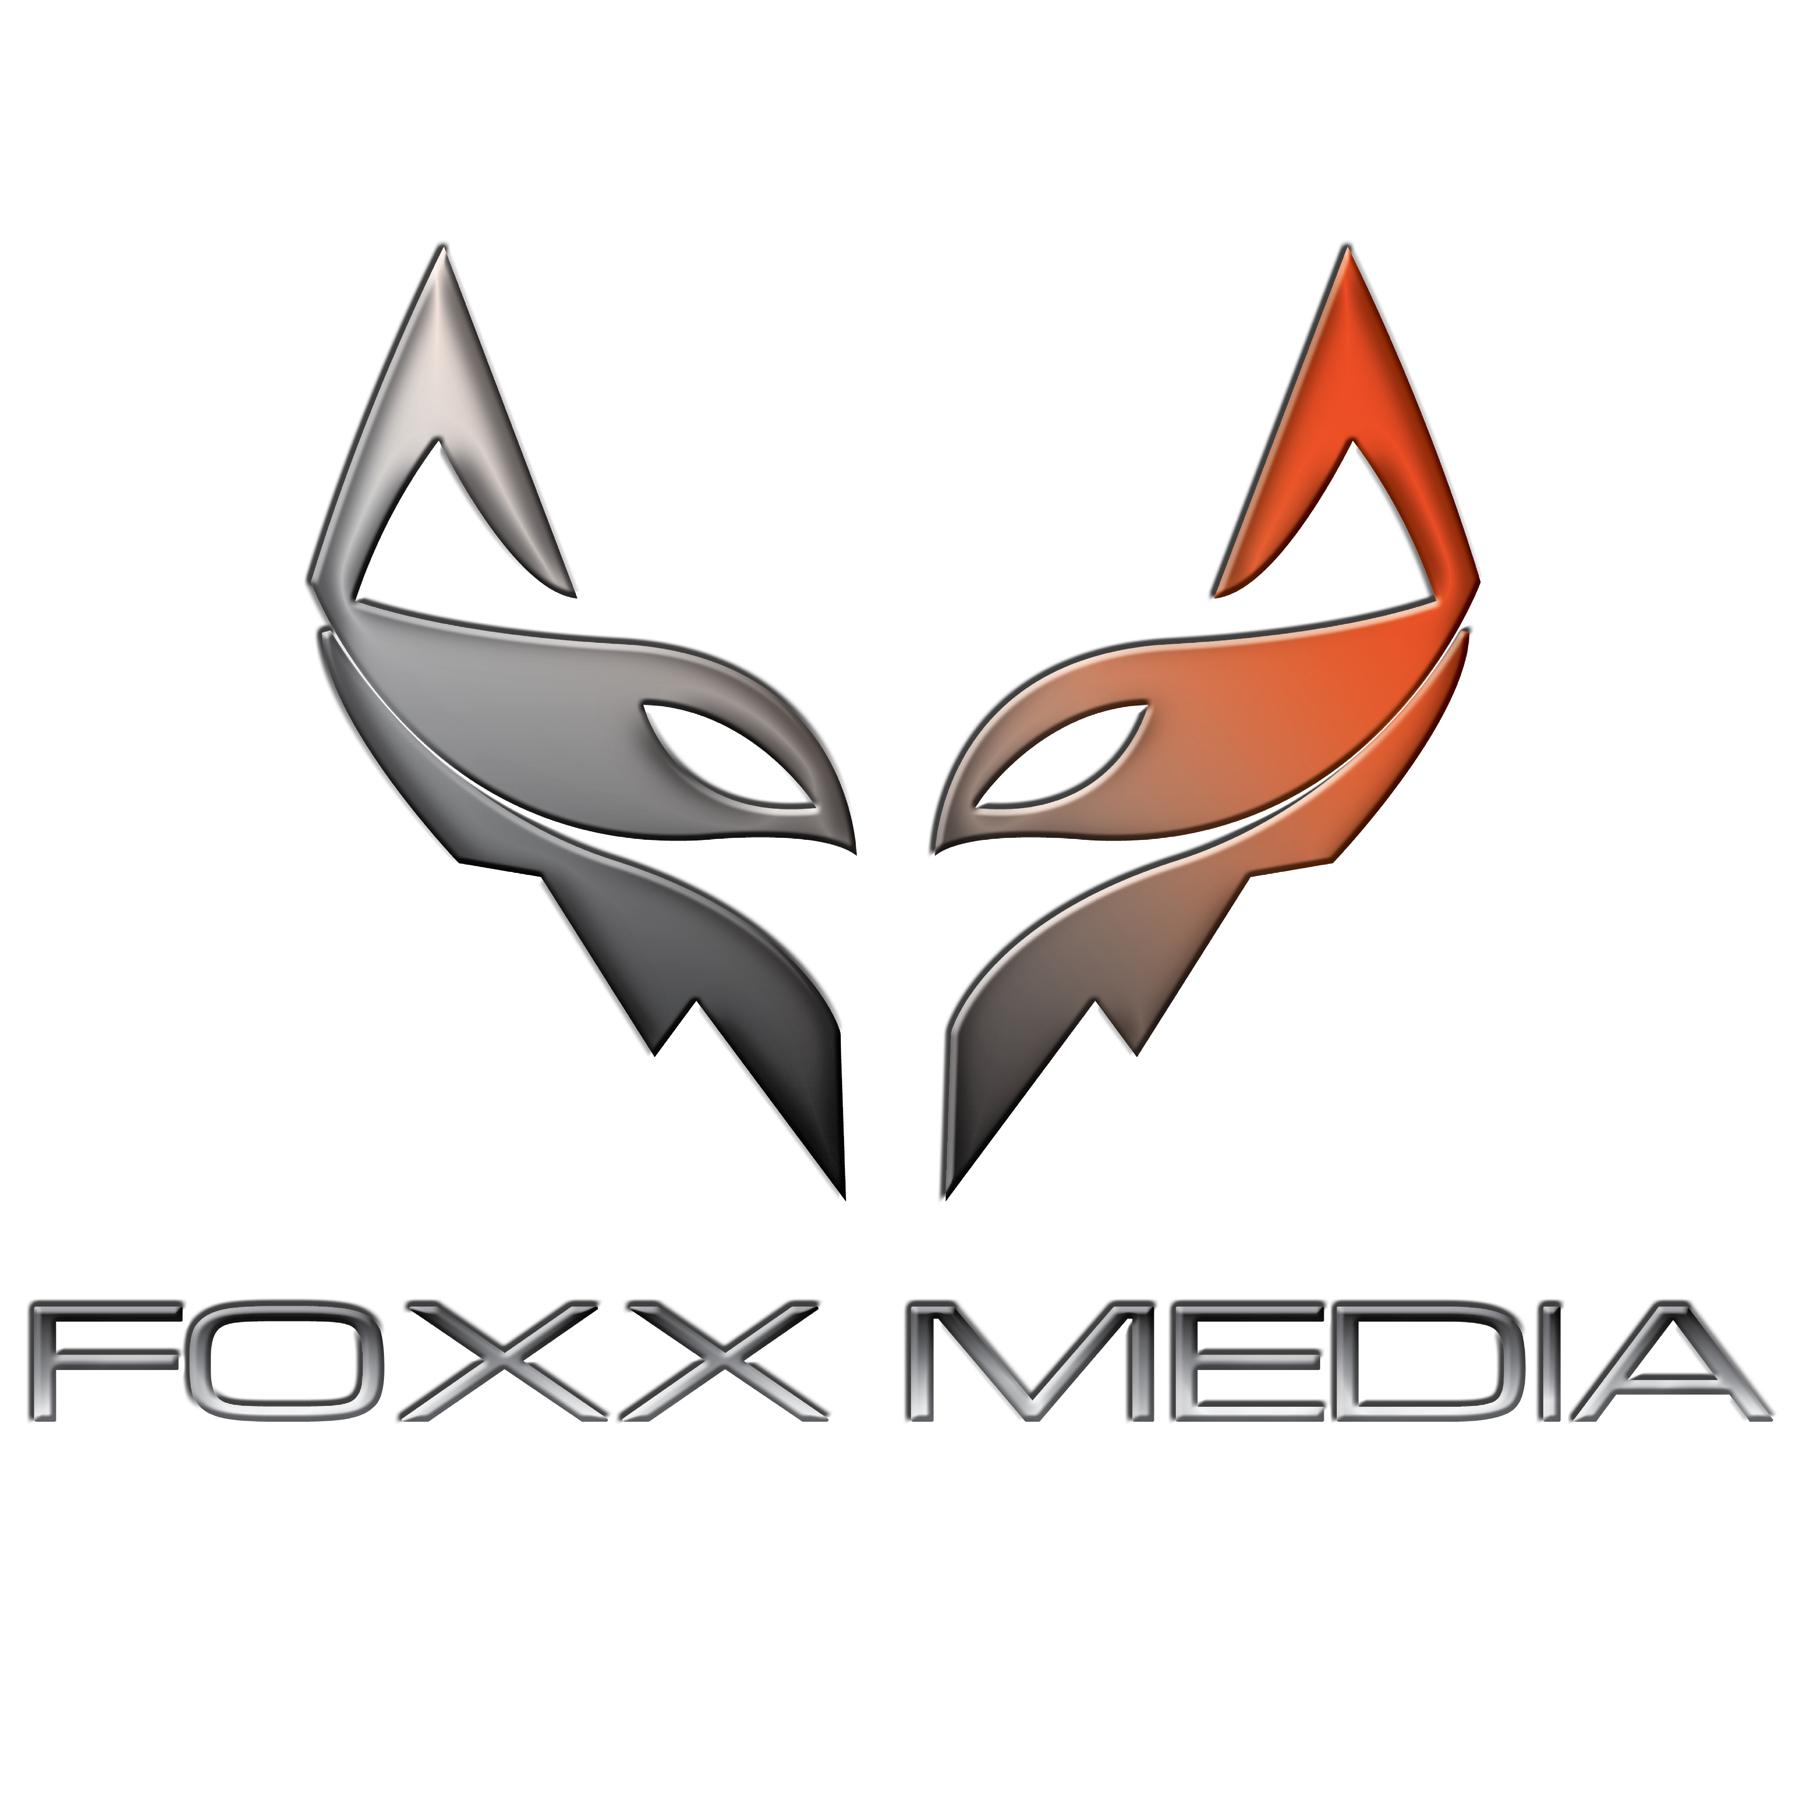 Foxx Media Online Marketing